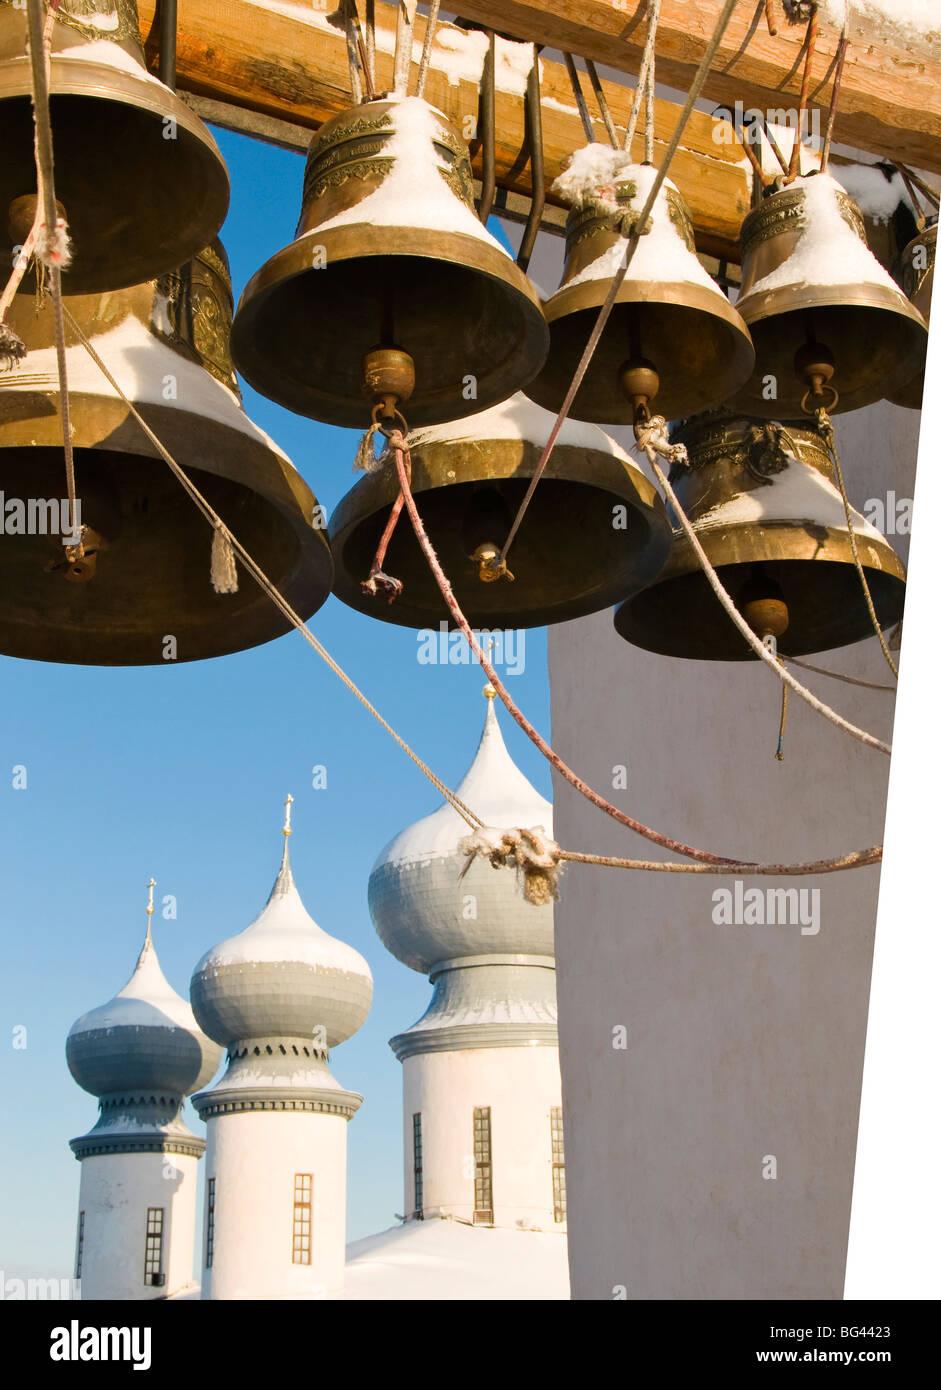 Bell tower, Bogorodichno-Uspenskij Monastery, Leningrad region, Russia - Stock Image